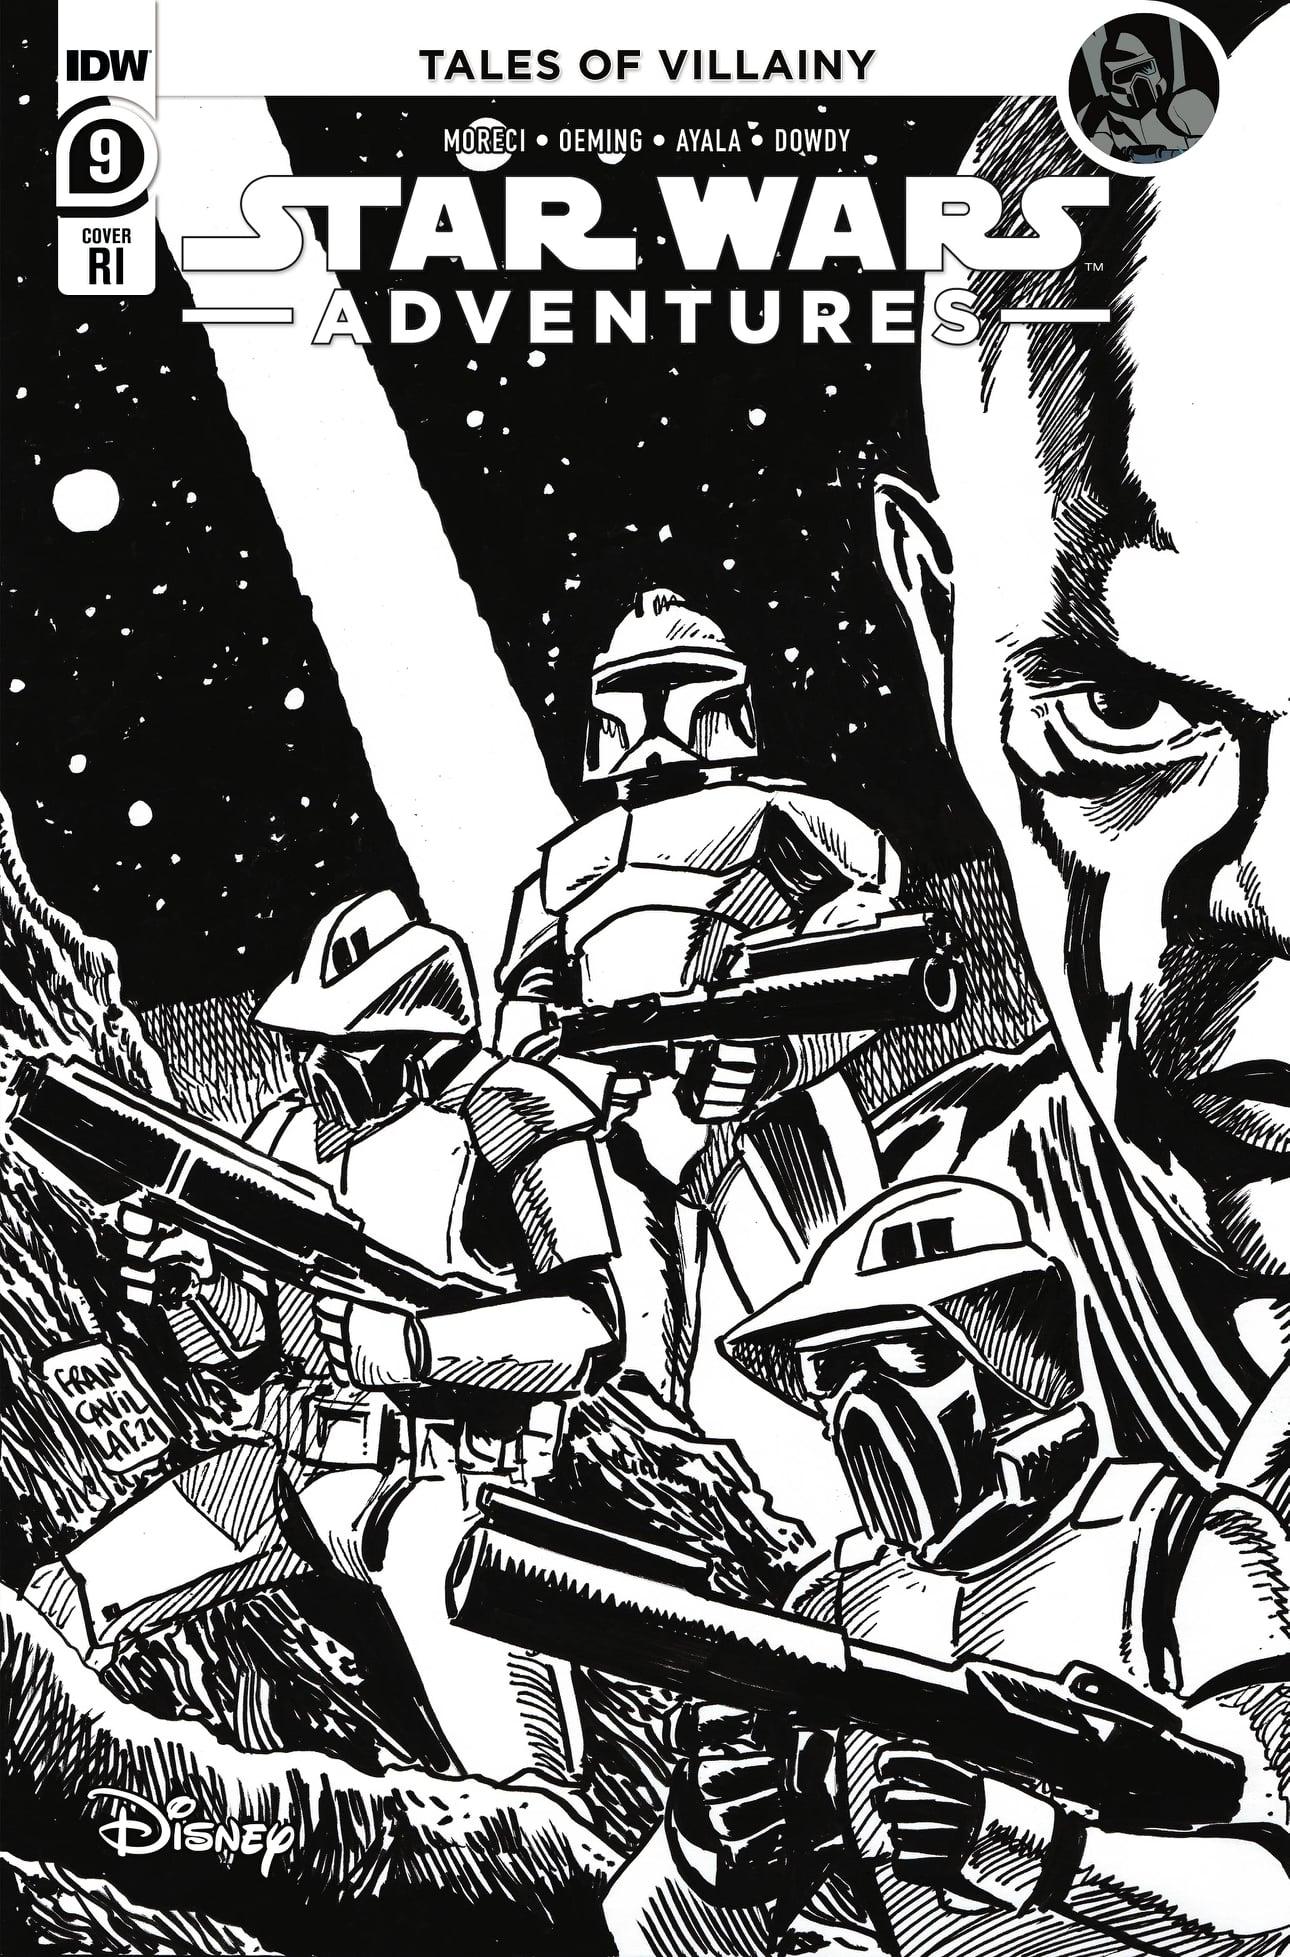 Star Wars Adventures 9 (IDW 2020) RI Cover Francavilla